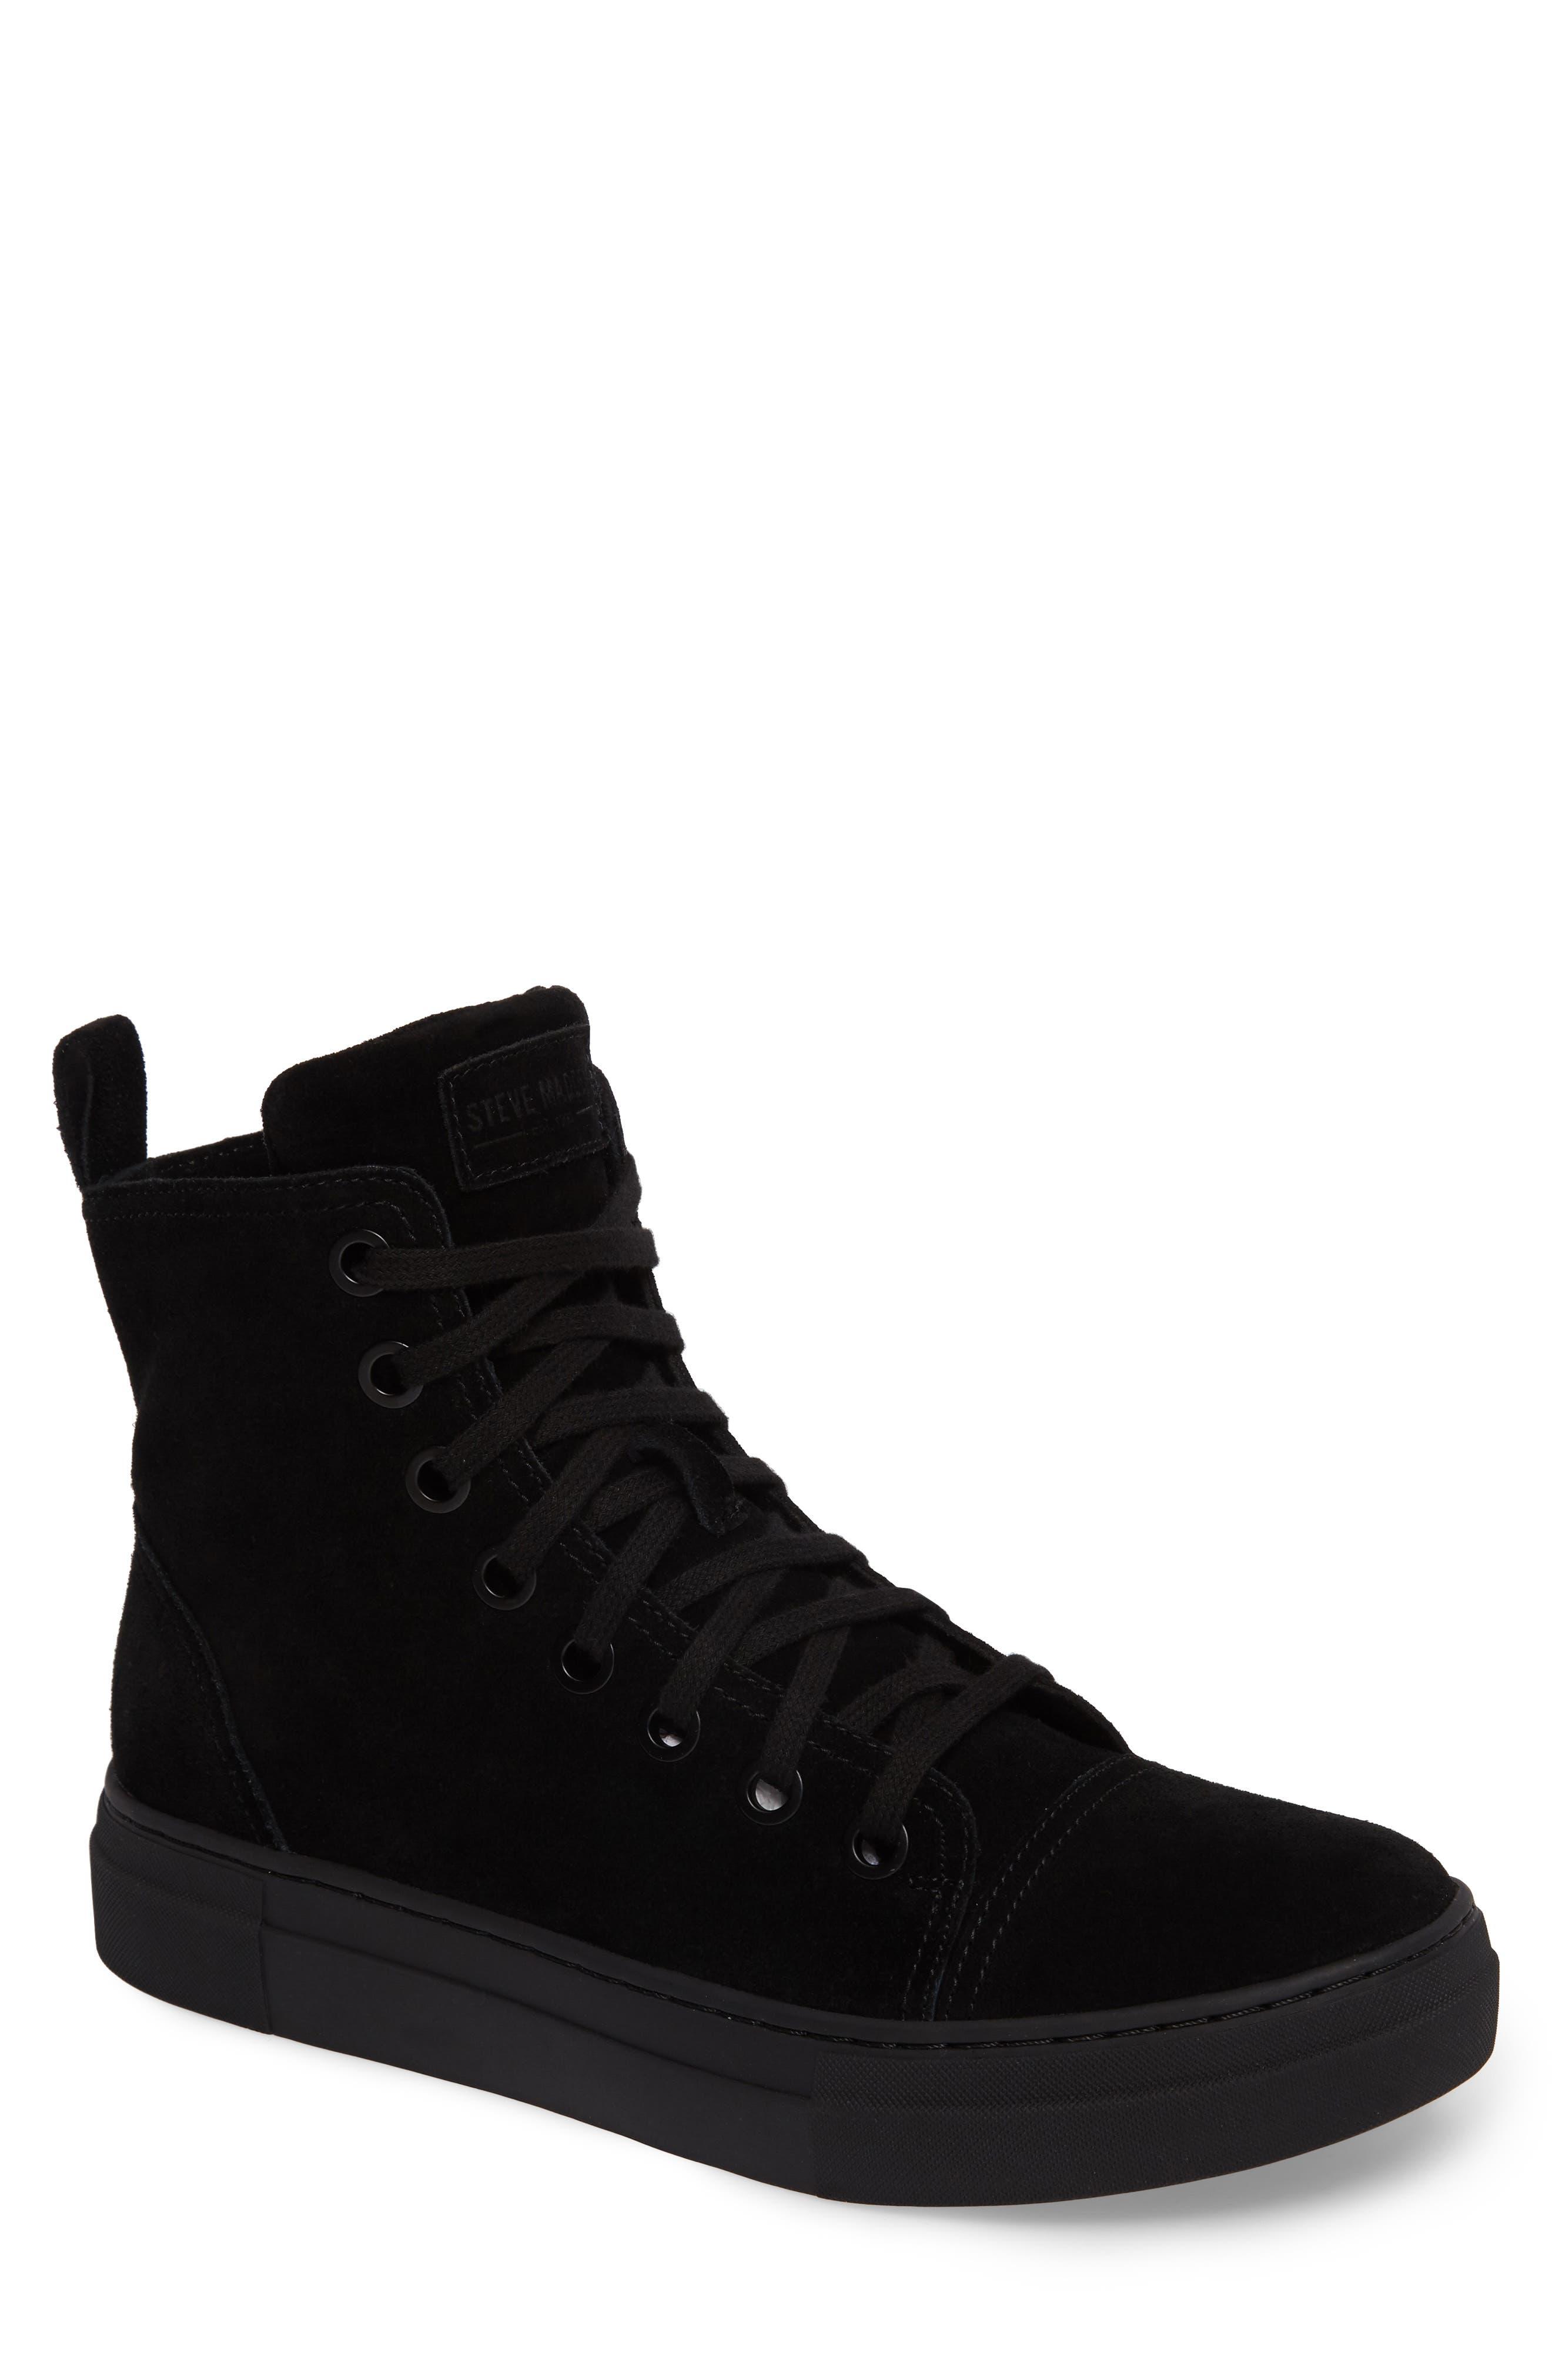 Ormisten Sneaker,                             Main thumbnail 1, color,